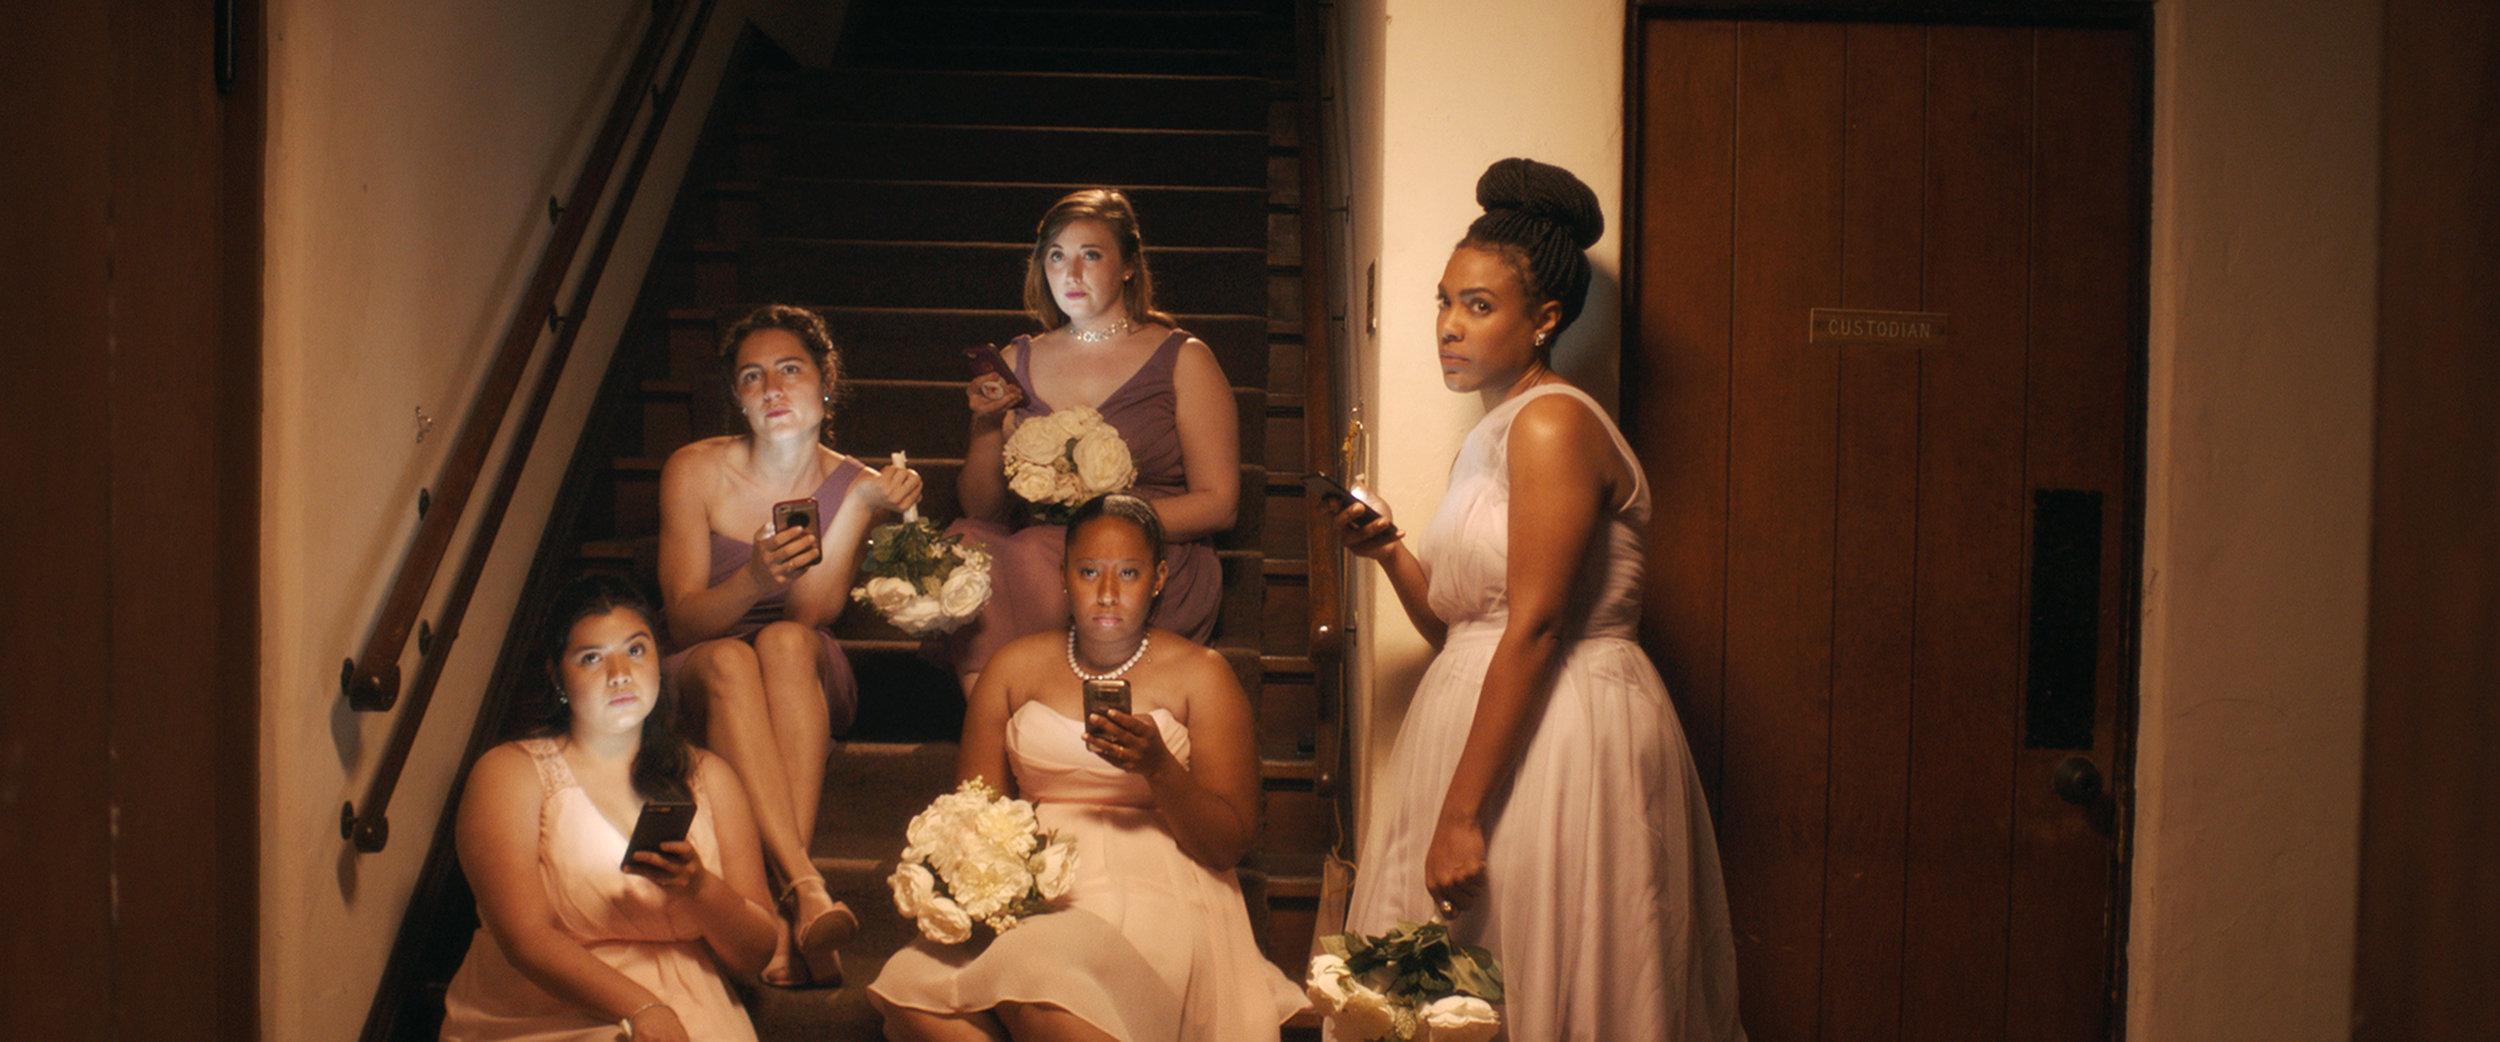 A Greek chorus of bridesmaids